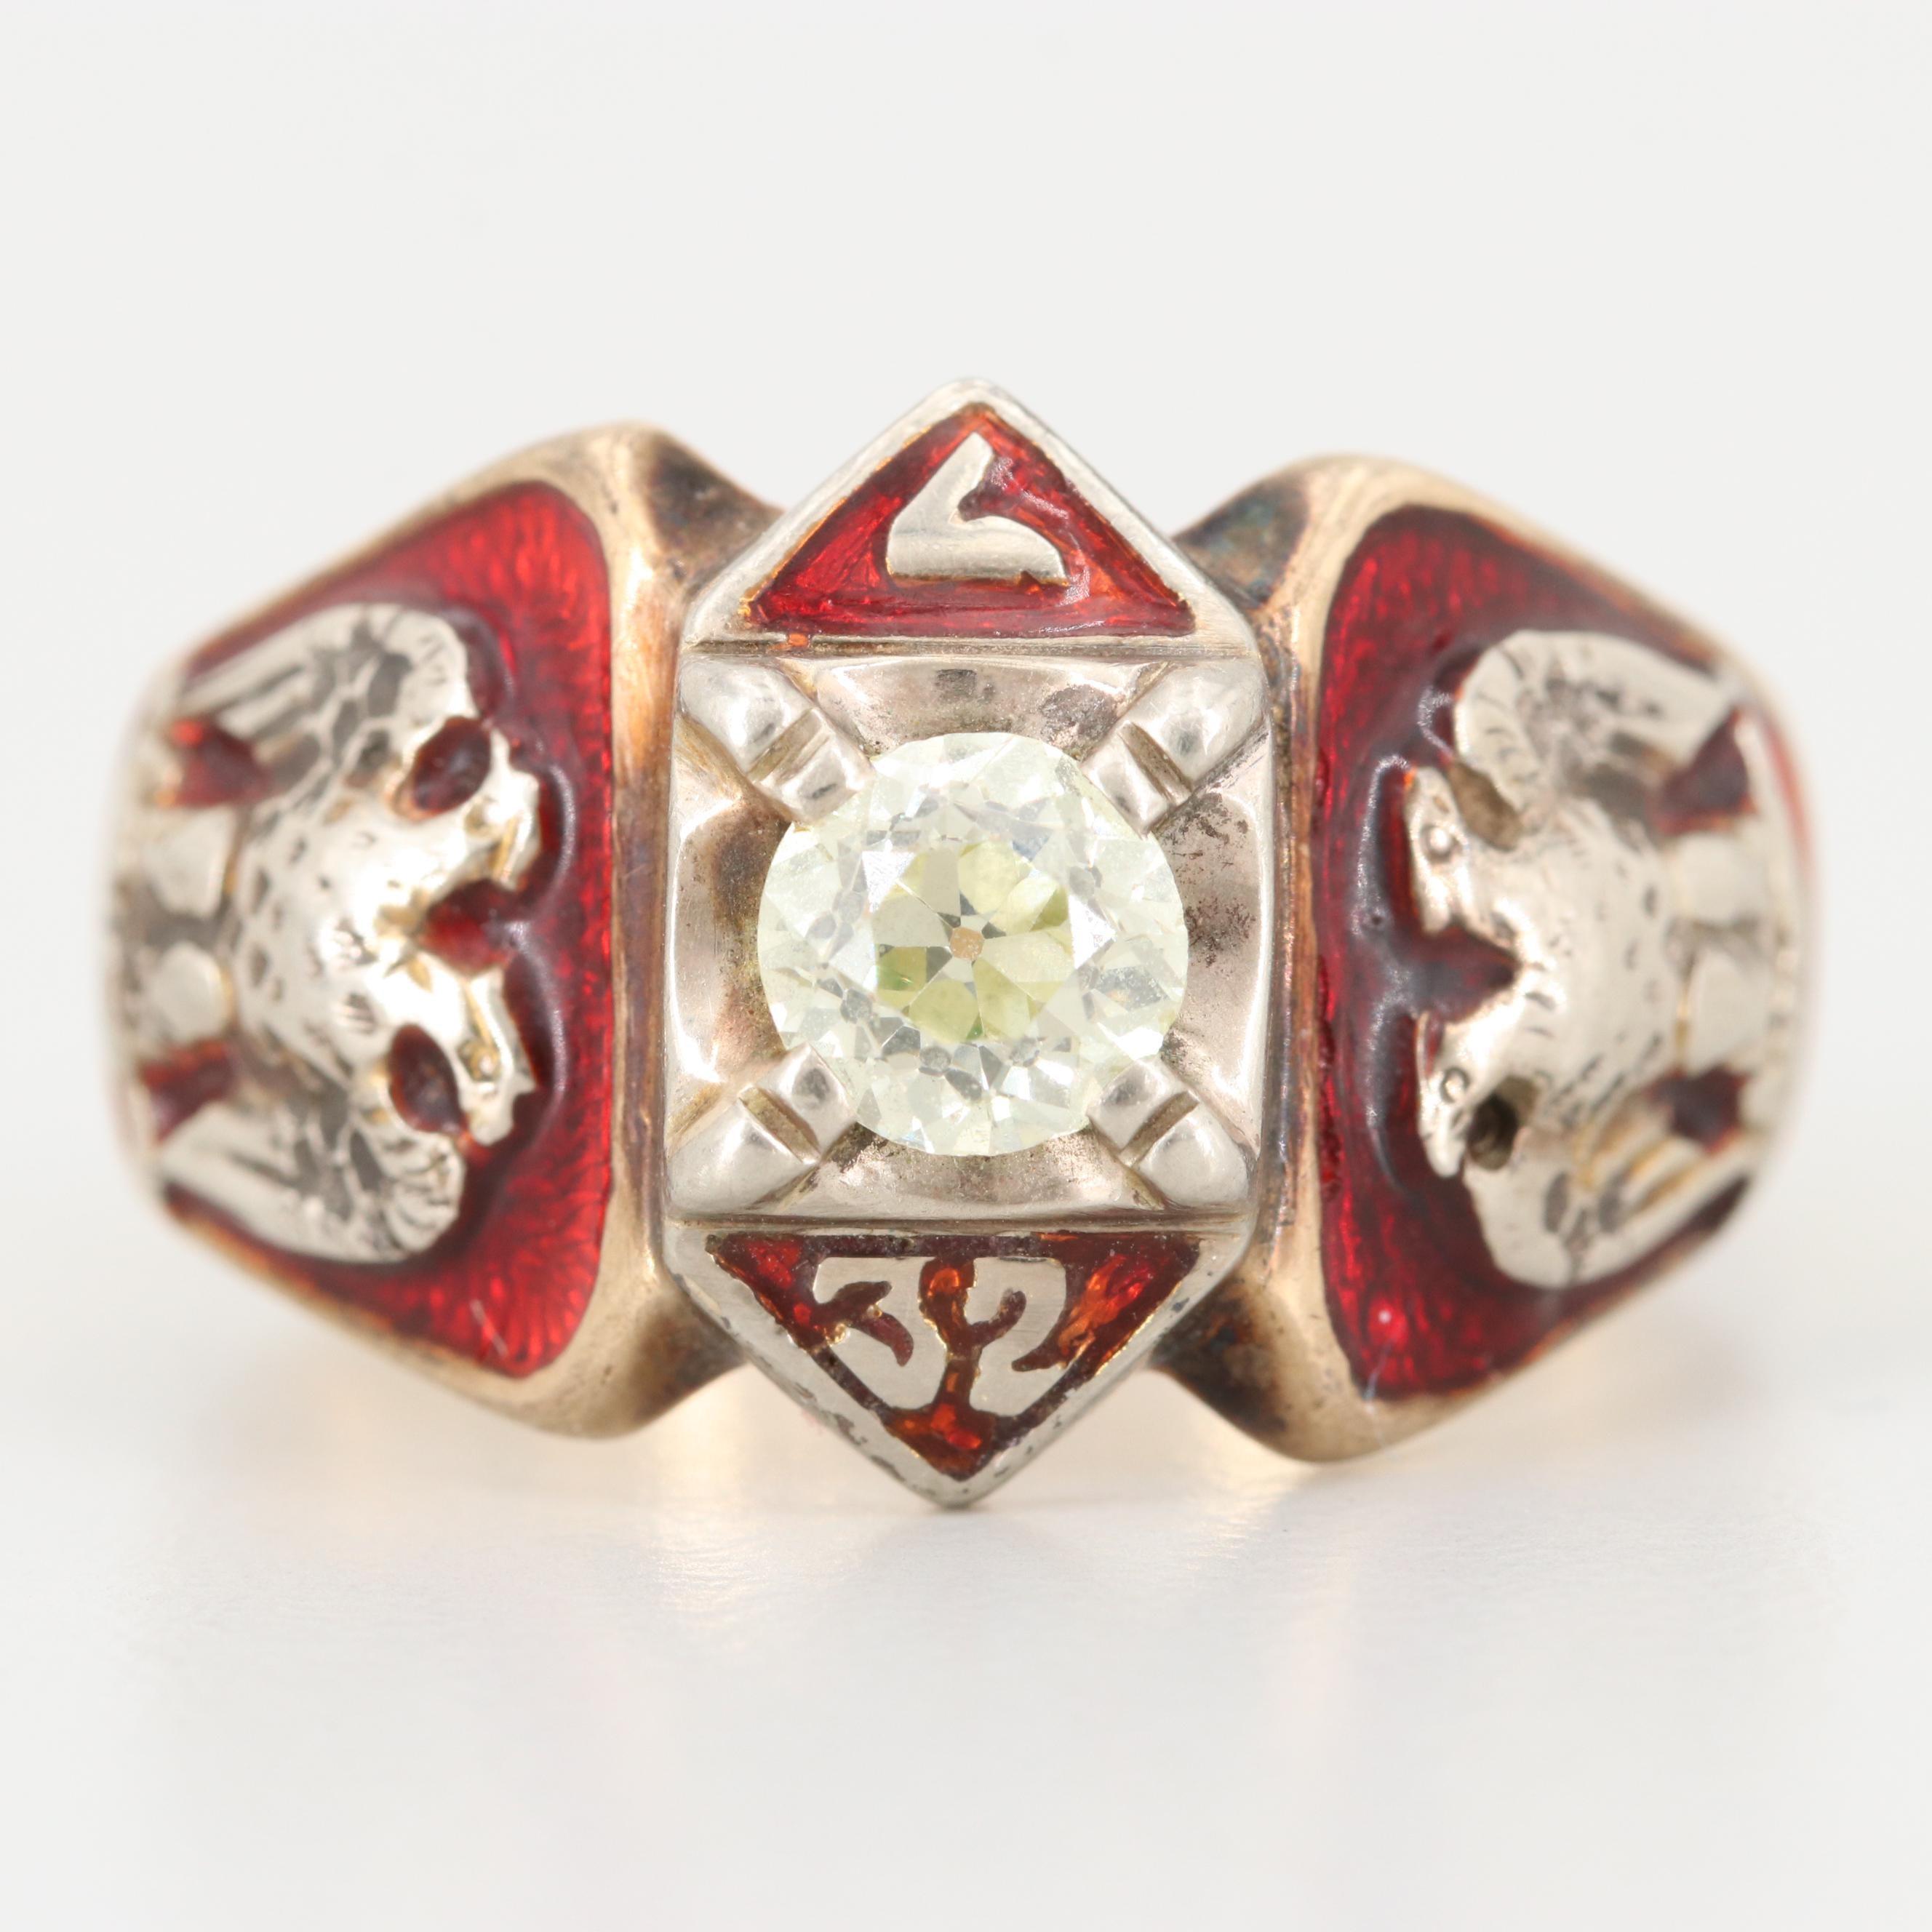 10K Yellow Gold Diamond and Enamel Scottish Rite Masonic Ring